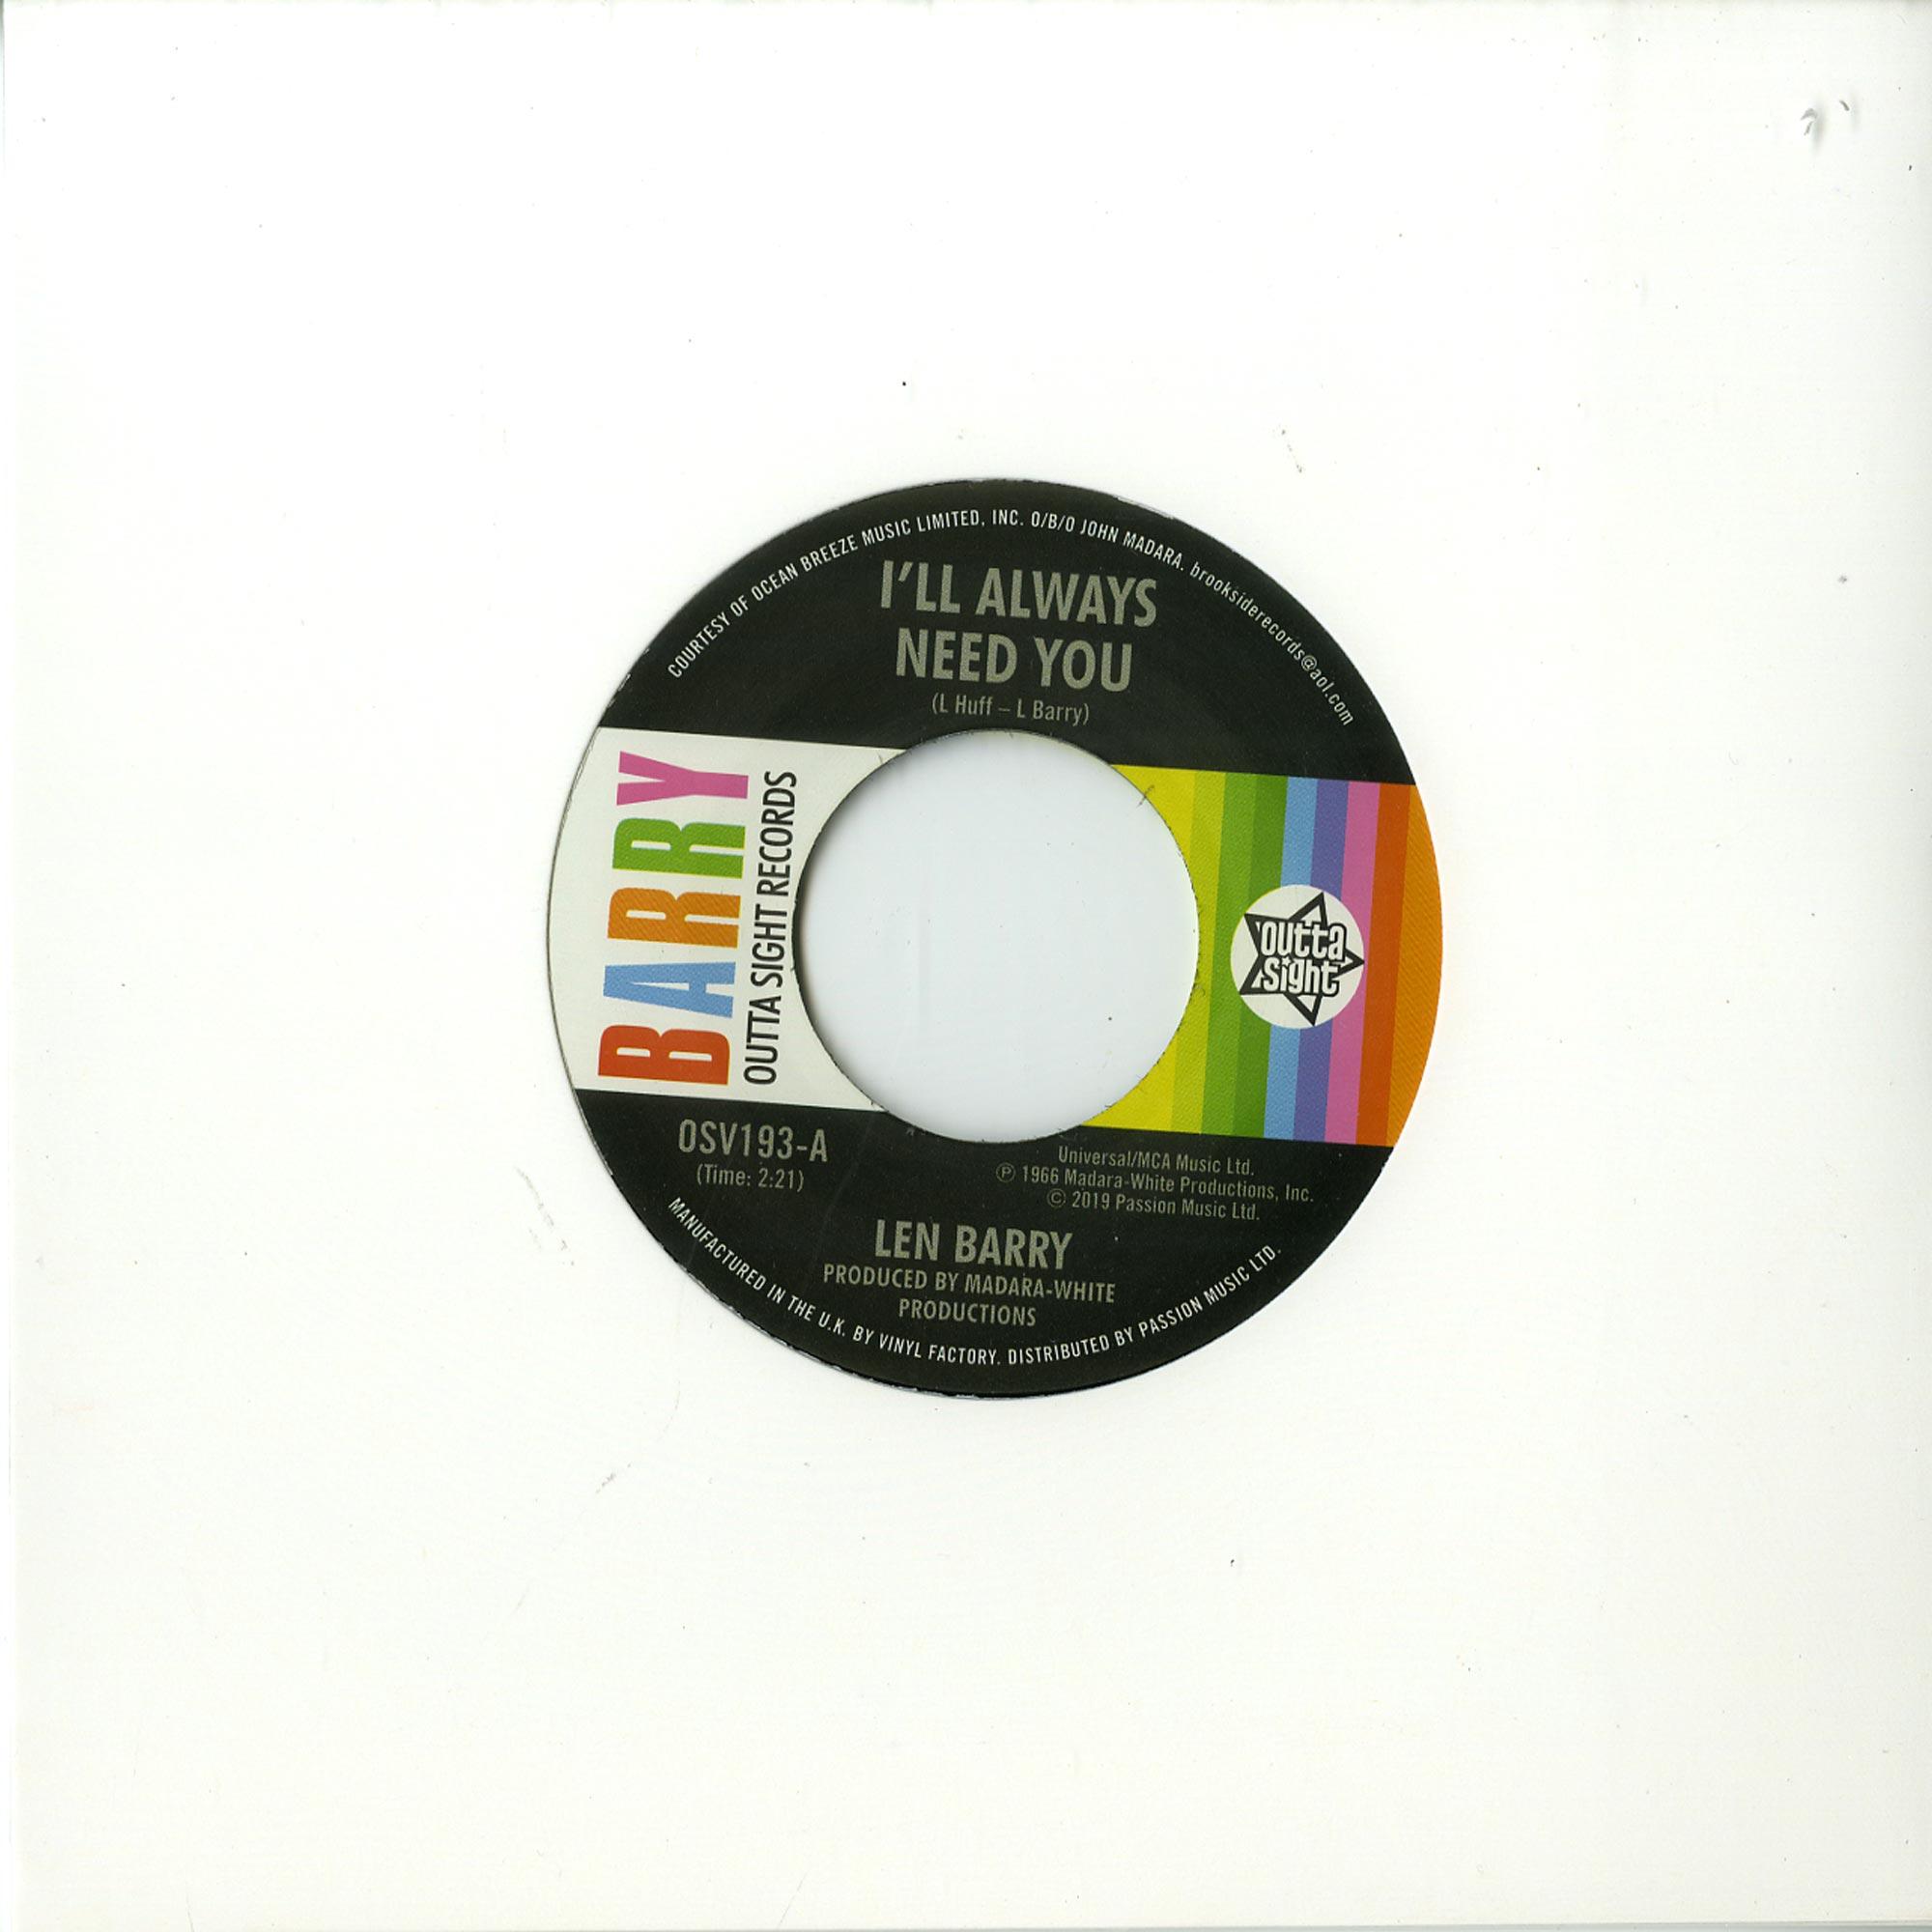 Len Barry - ILL ALWAYS NEED YOU / LOVE LOVE LOVE